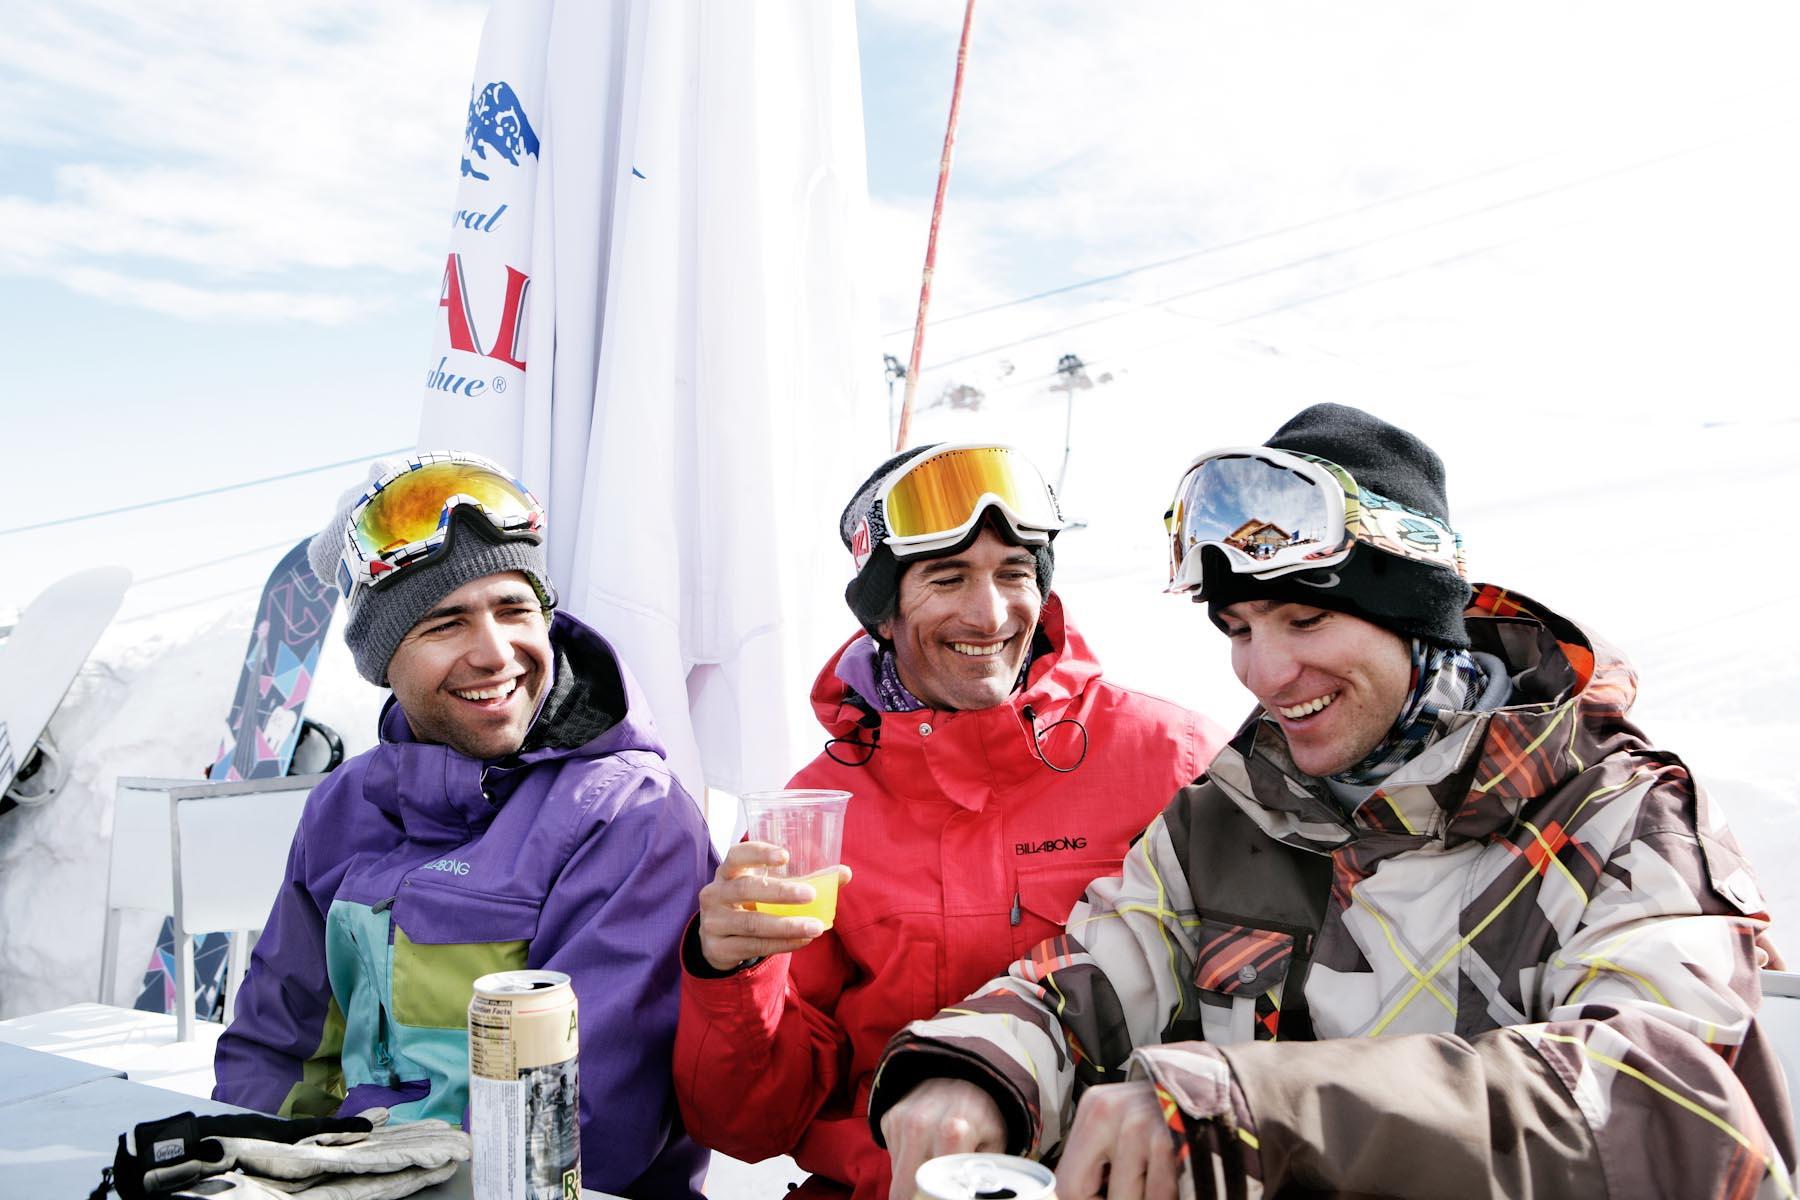 friends in valle nevado